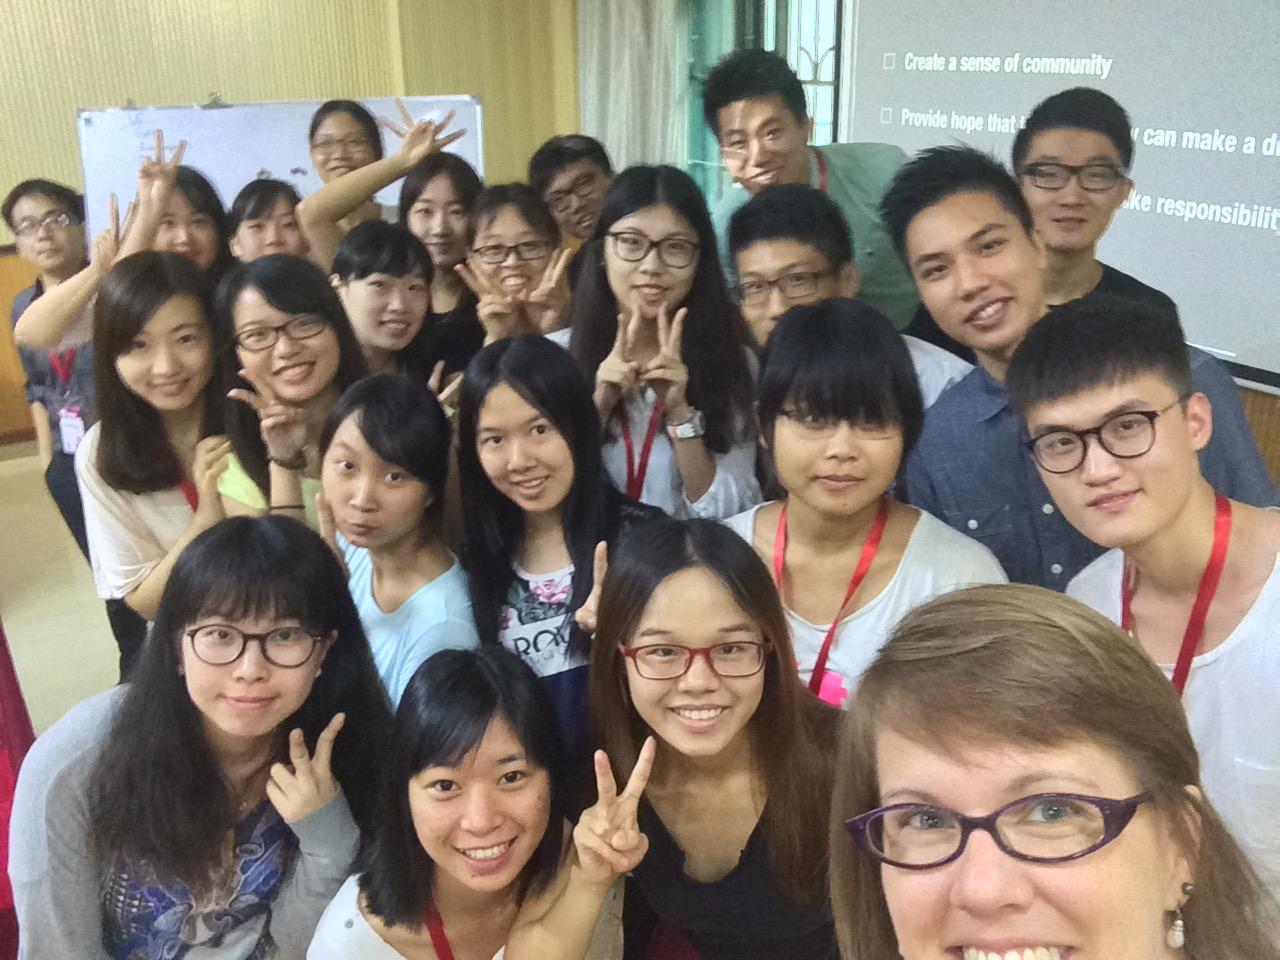 Guangzhou, China - session 1, leadership communications class